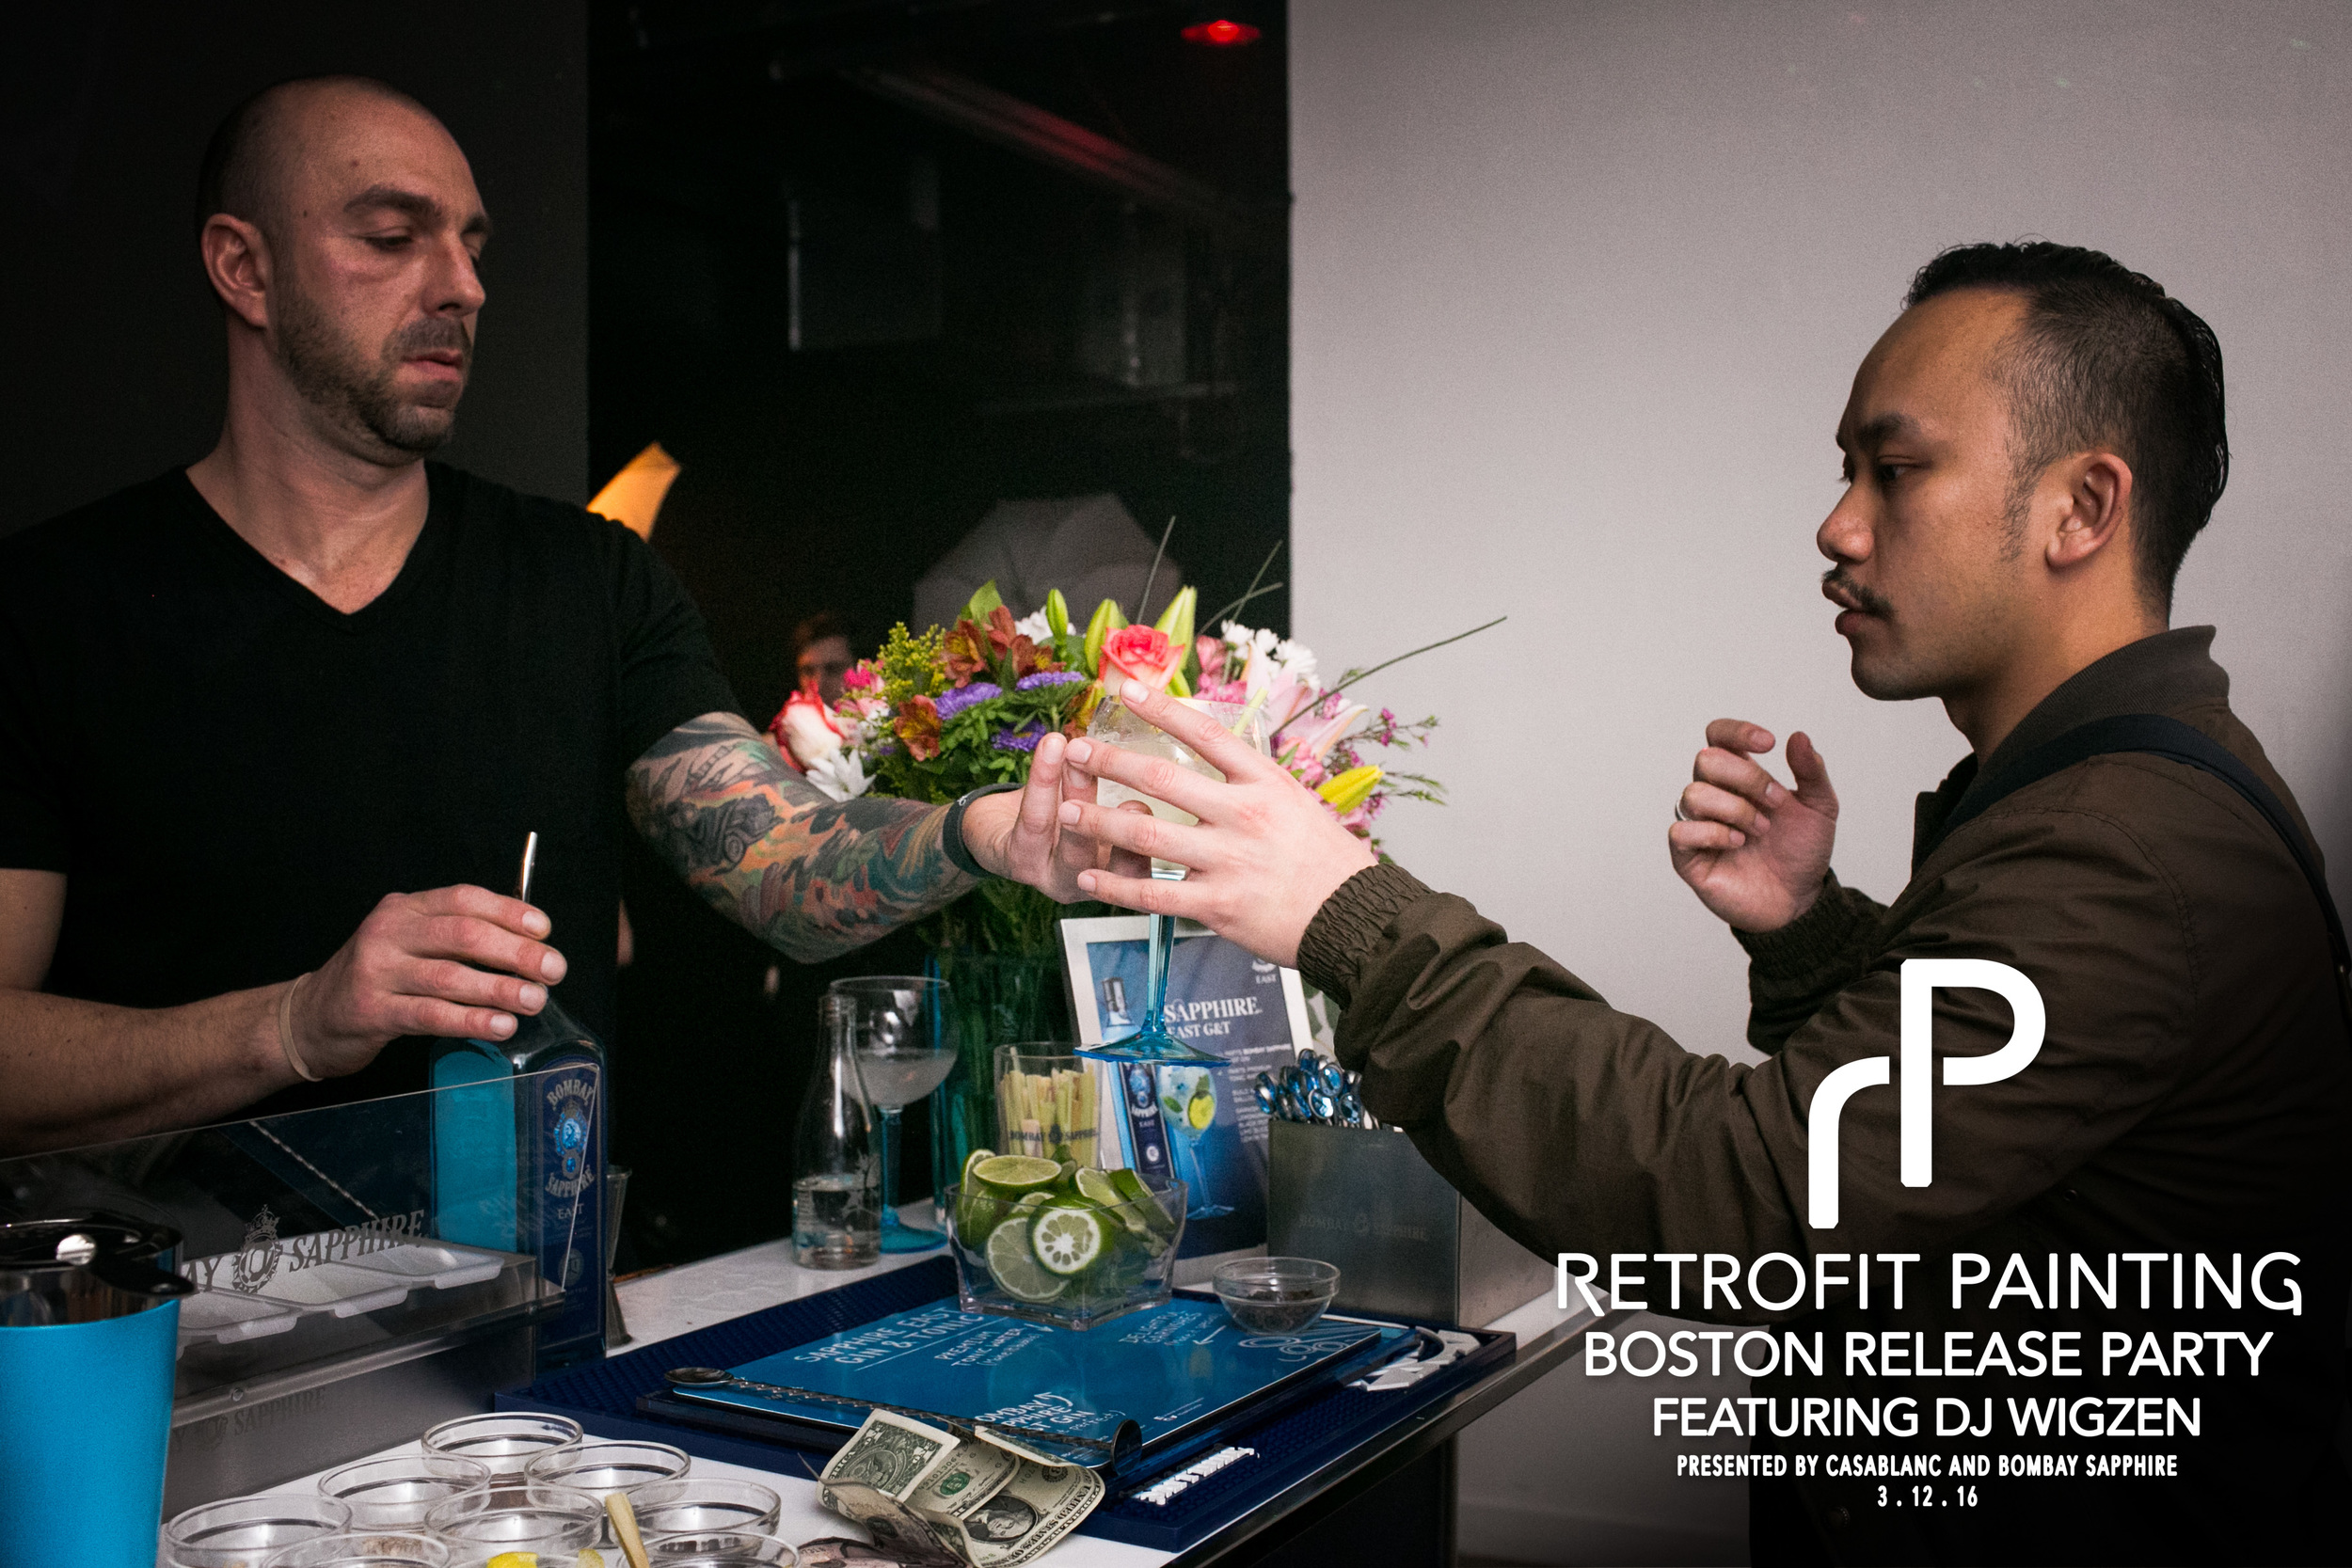 Retrofit Painting Boston Release Party 0185.jpg